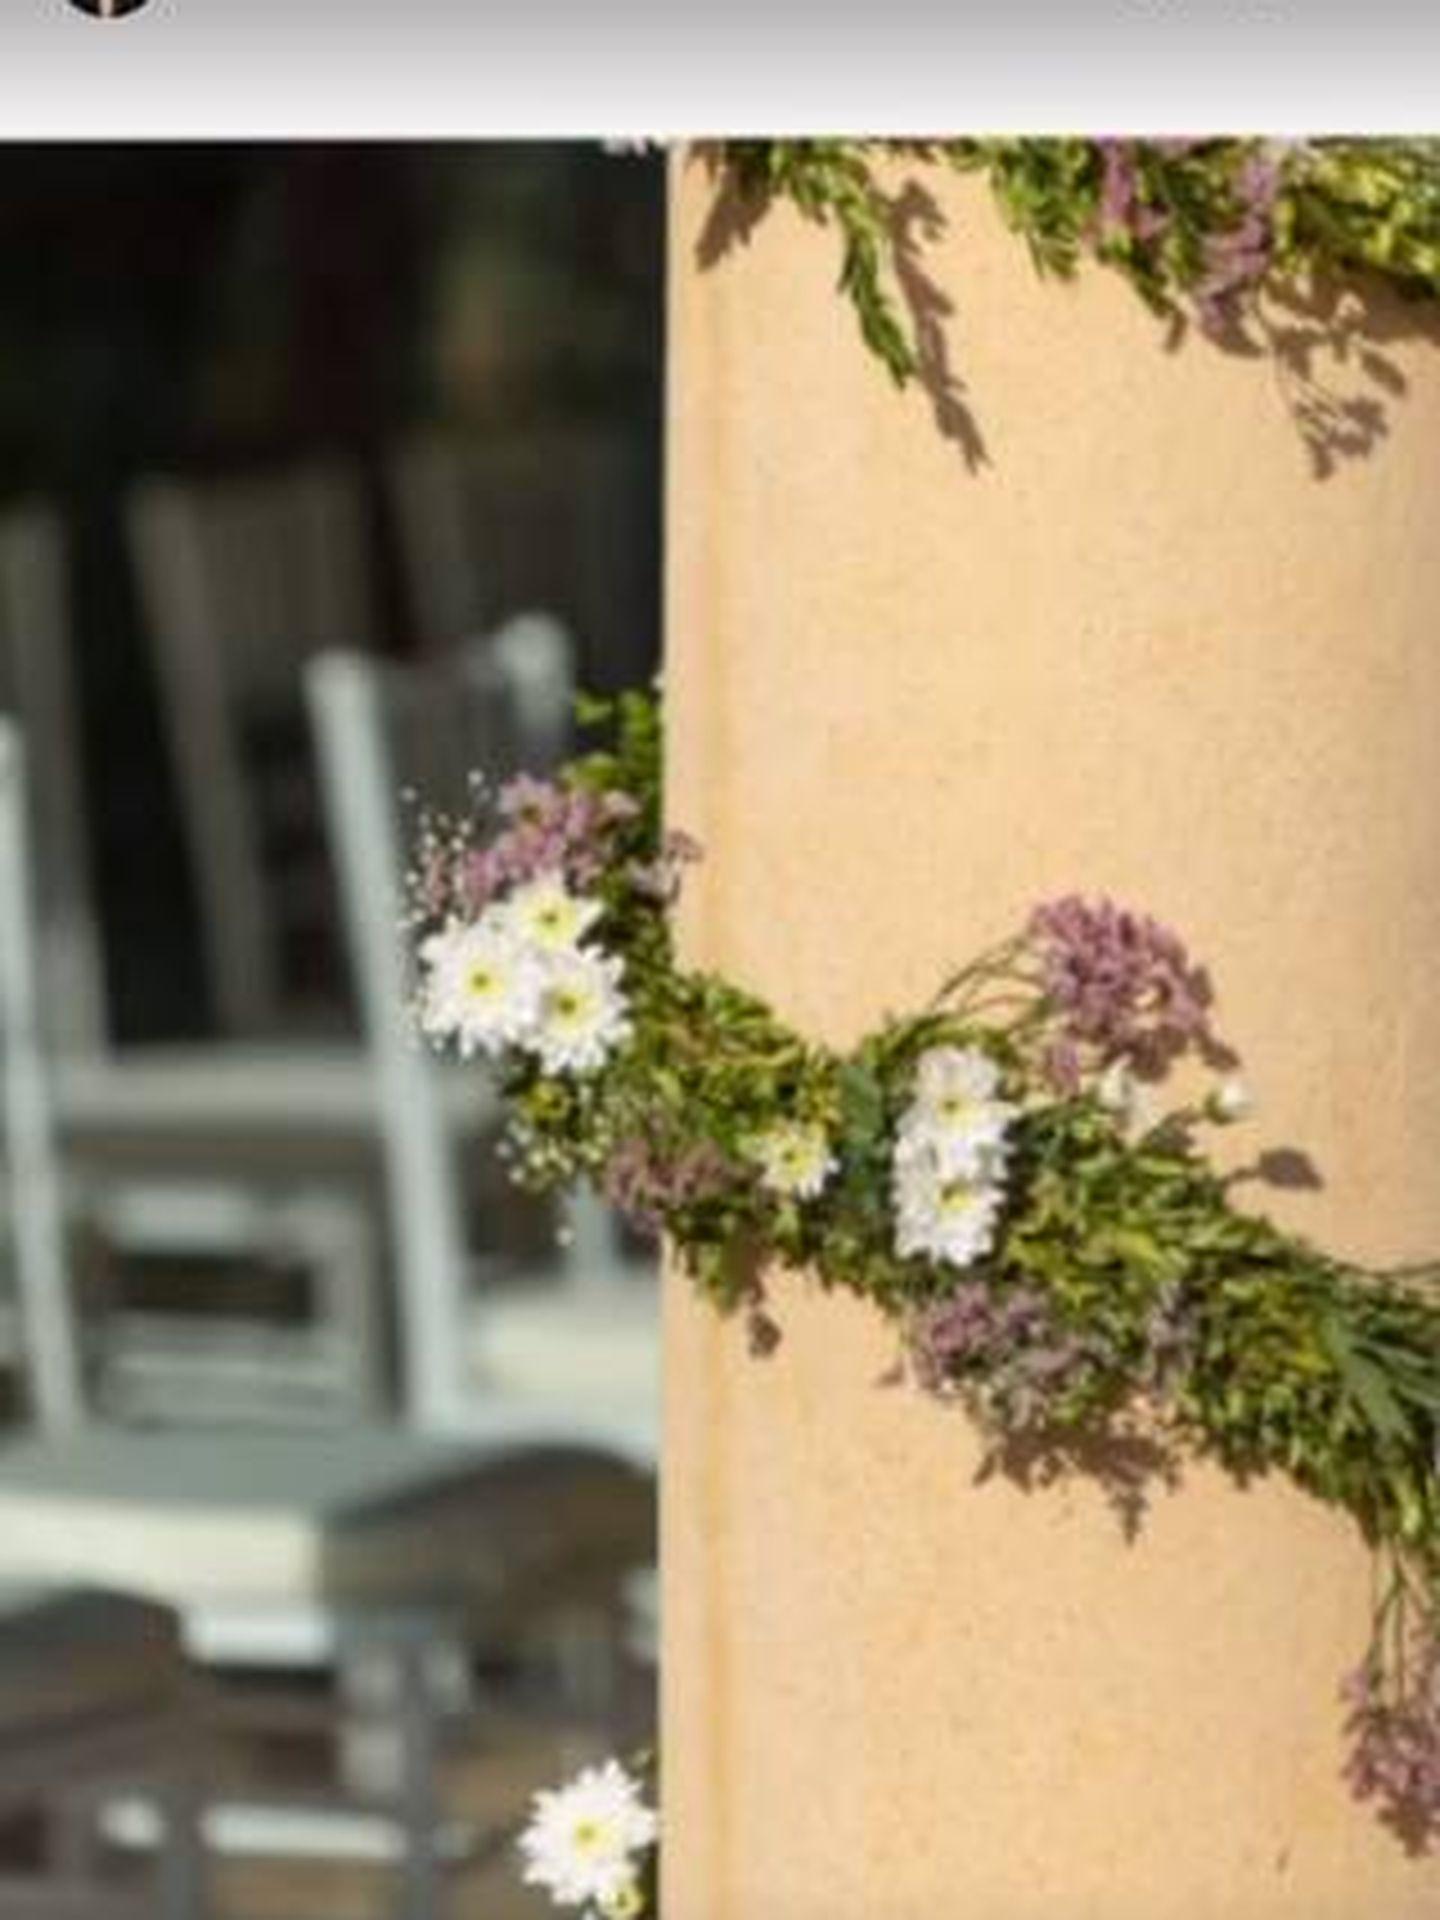 Detalles del adorno floral. (IG)